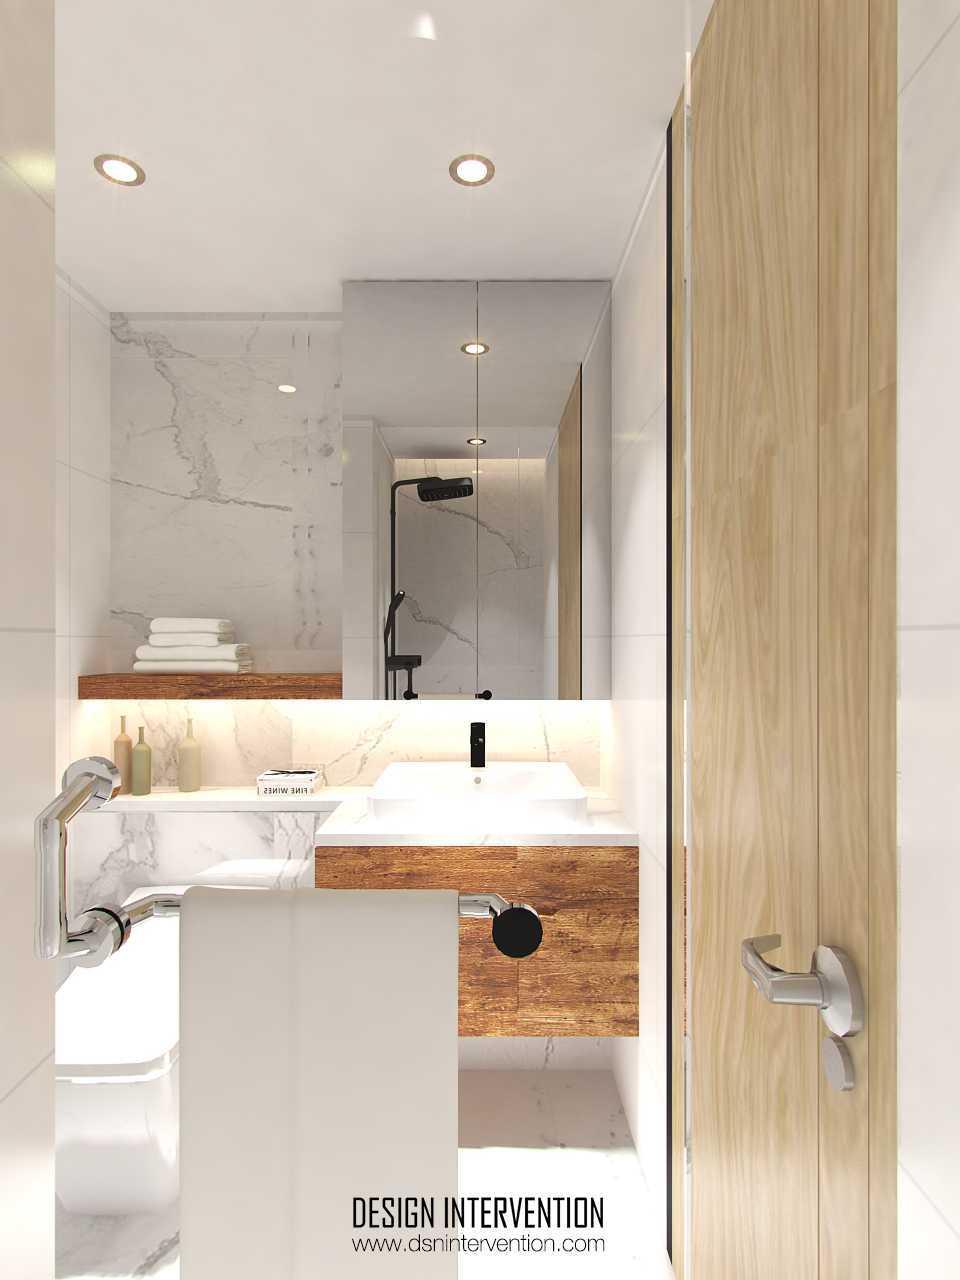 Design Intervention Pk Apartment Puri Kasablanka Apartment Puri Kasablanka Apartment Bathroom-View Skandinavia  14970